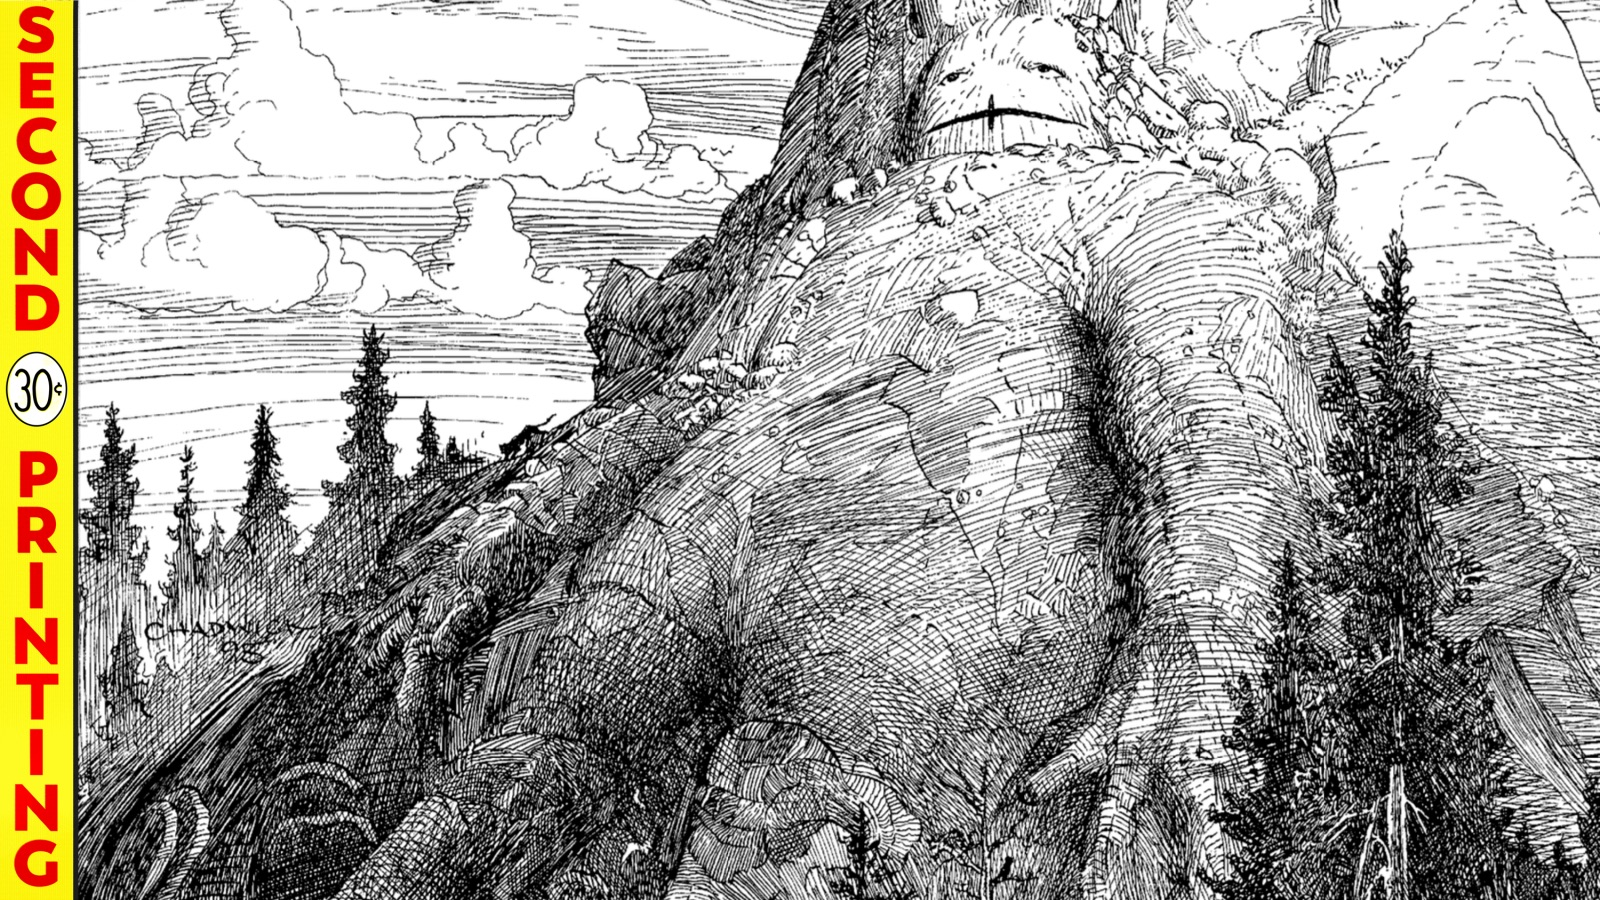 Concrete, by Paul Chadwin: read